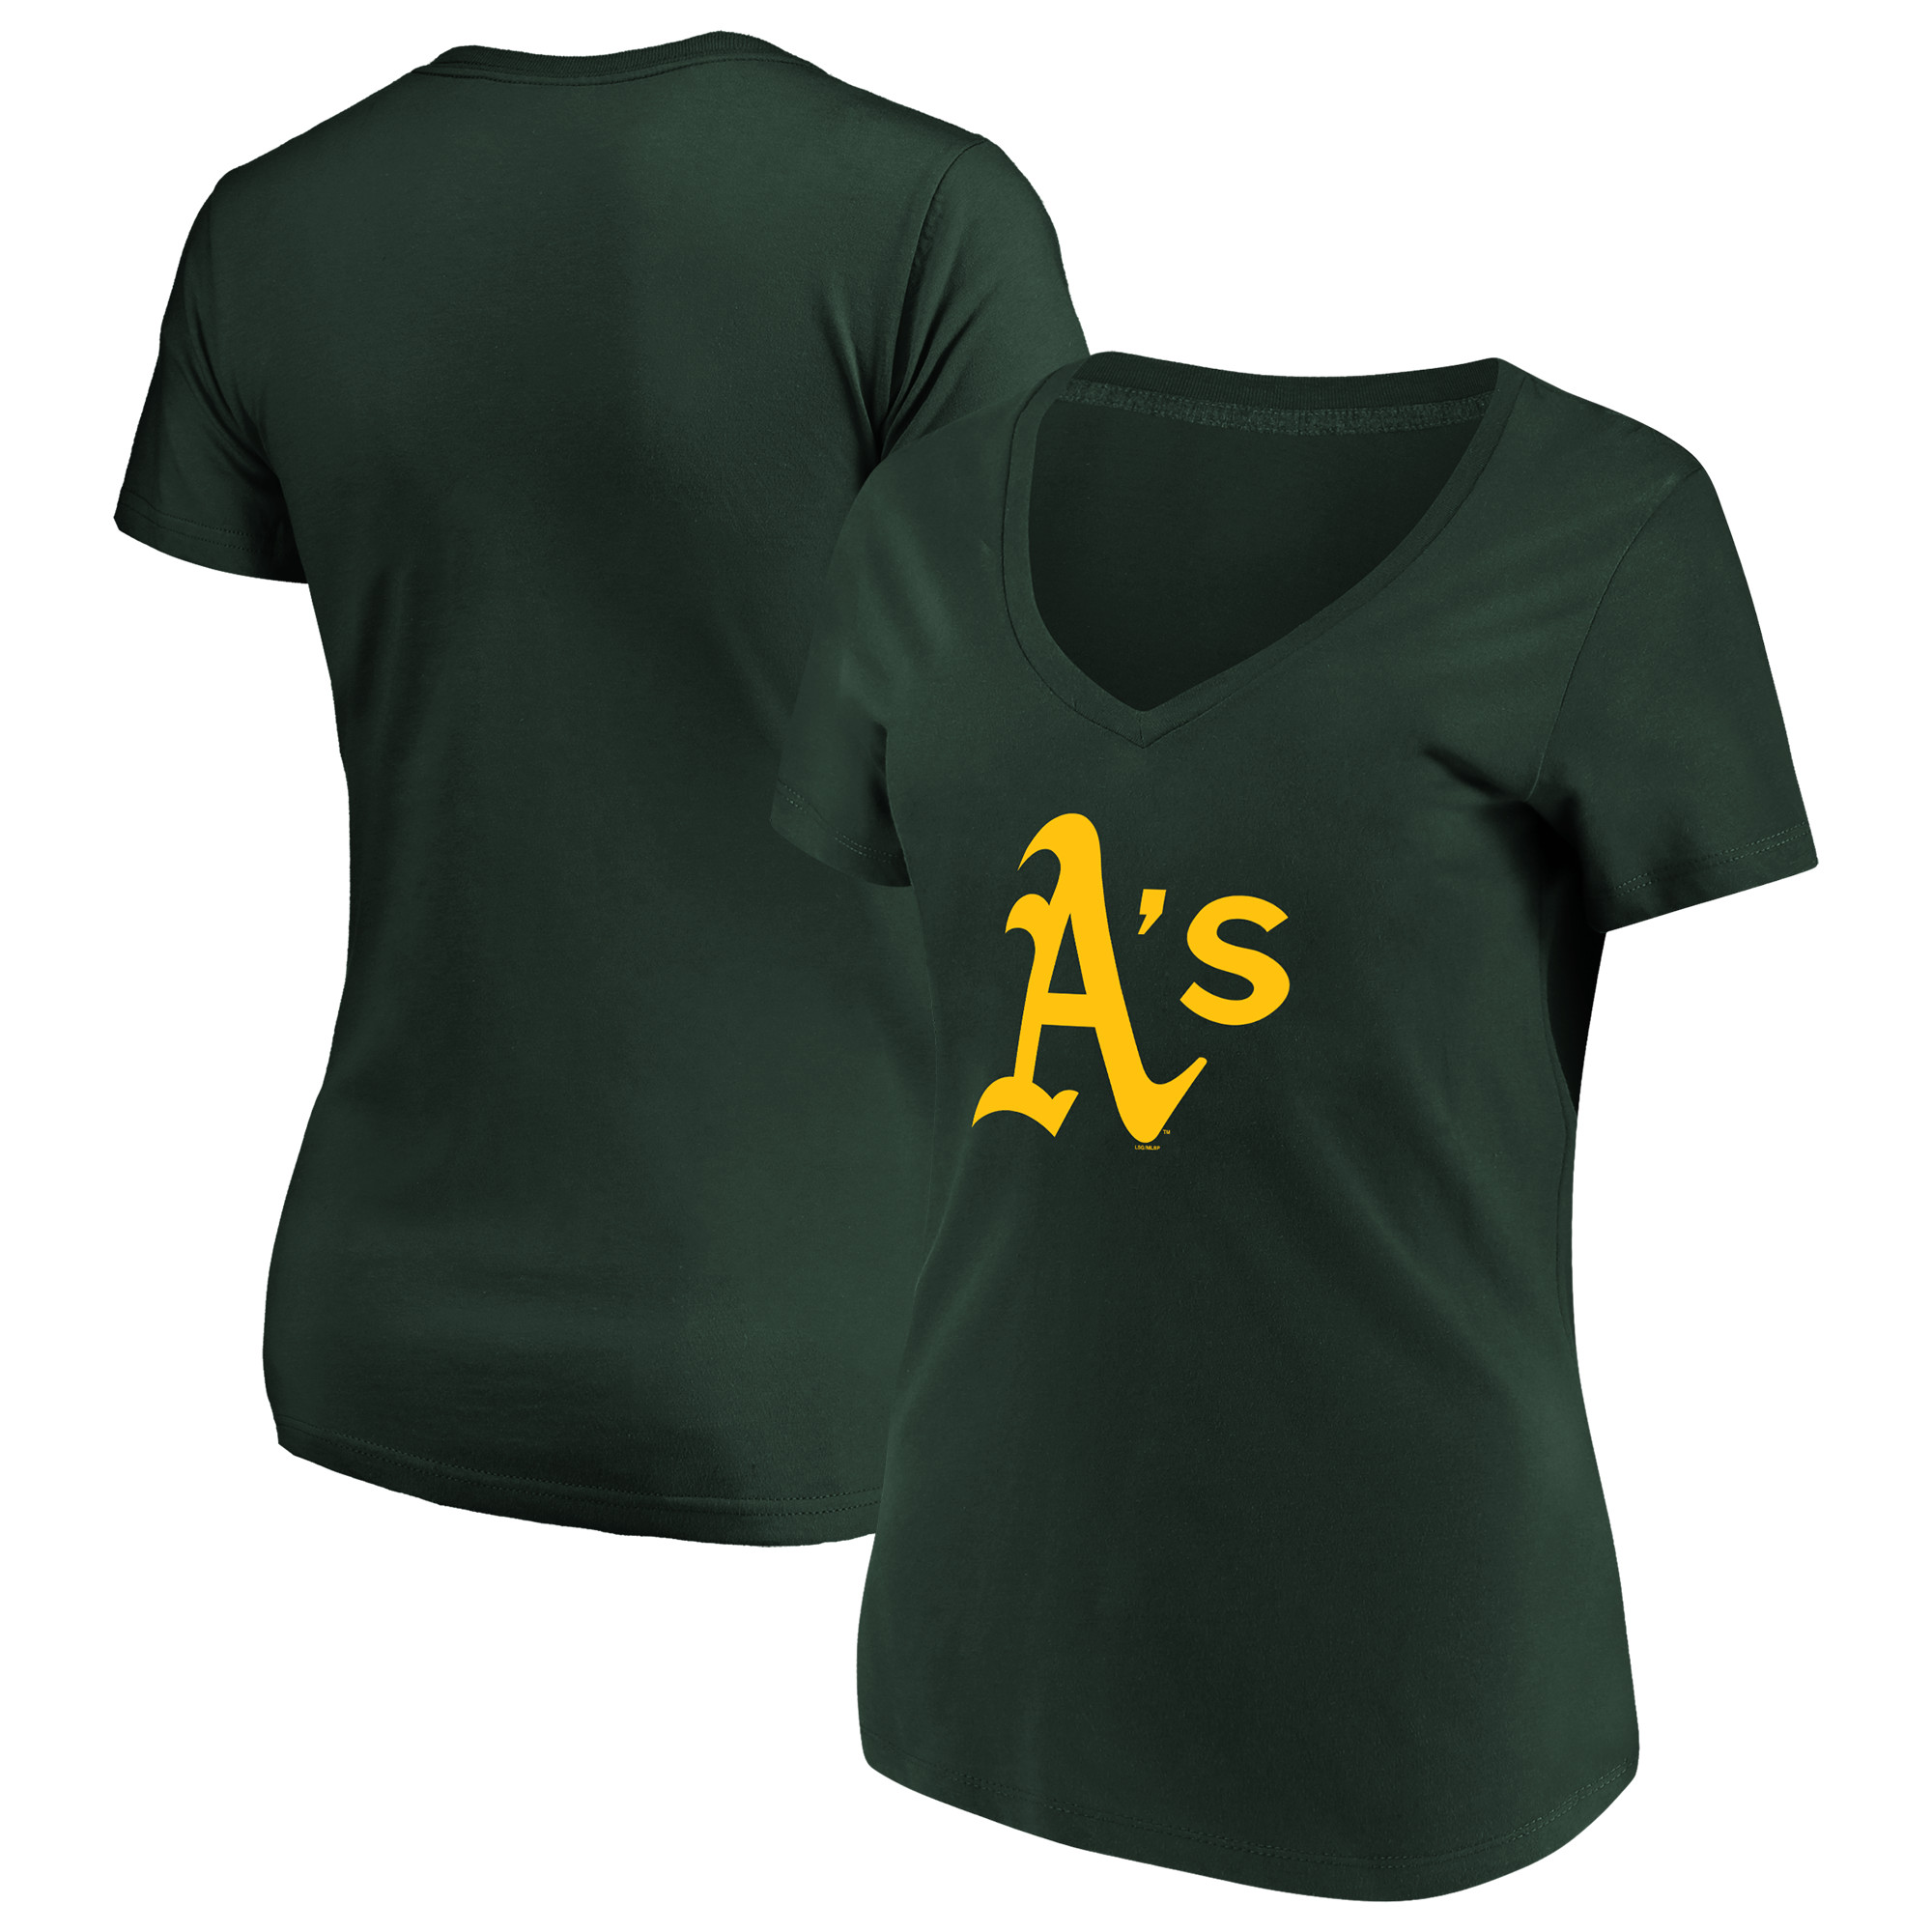 Women's Majestic Green Oakland Athletics Top Ranking V-Neck T-Shirt